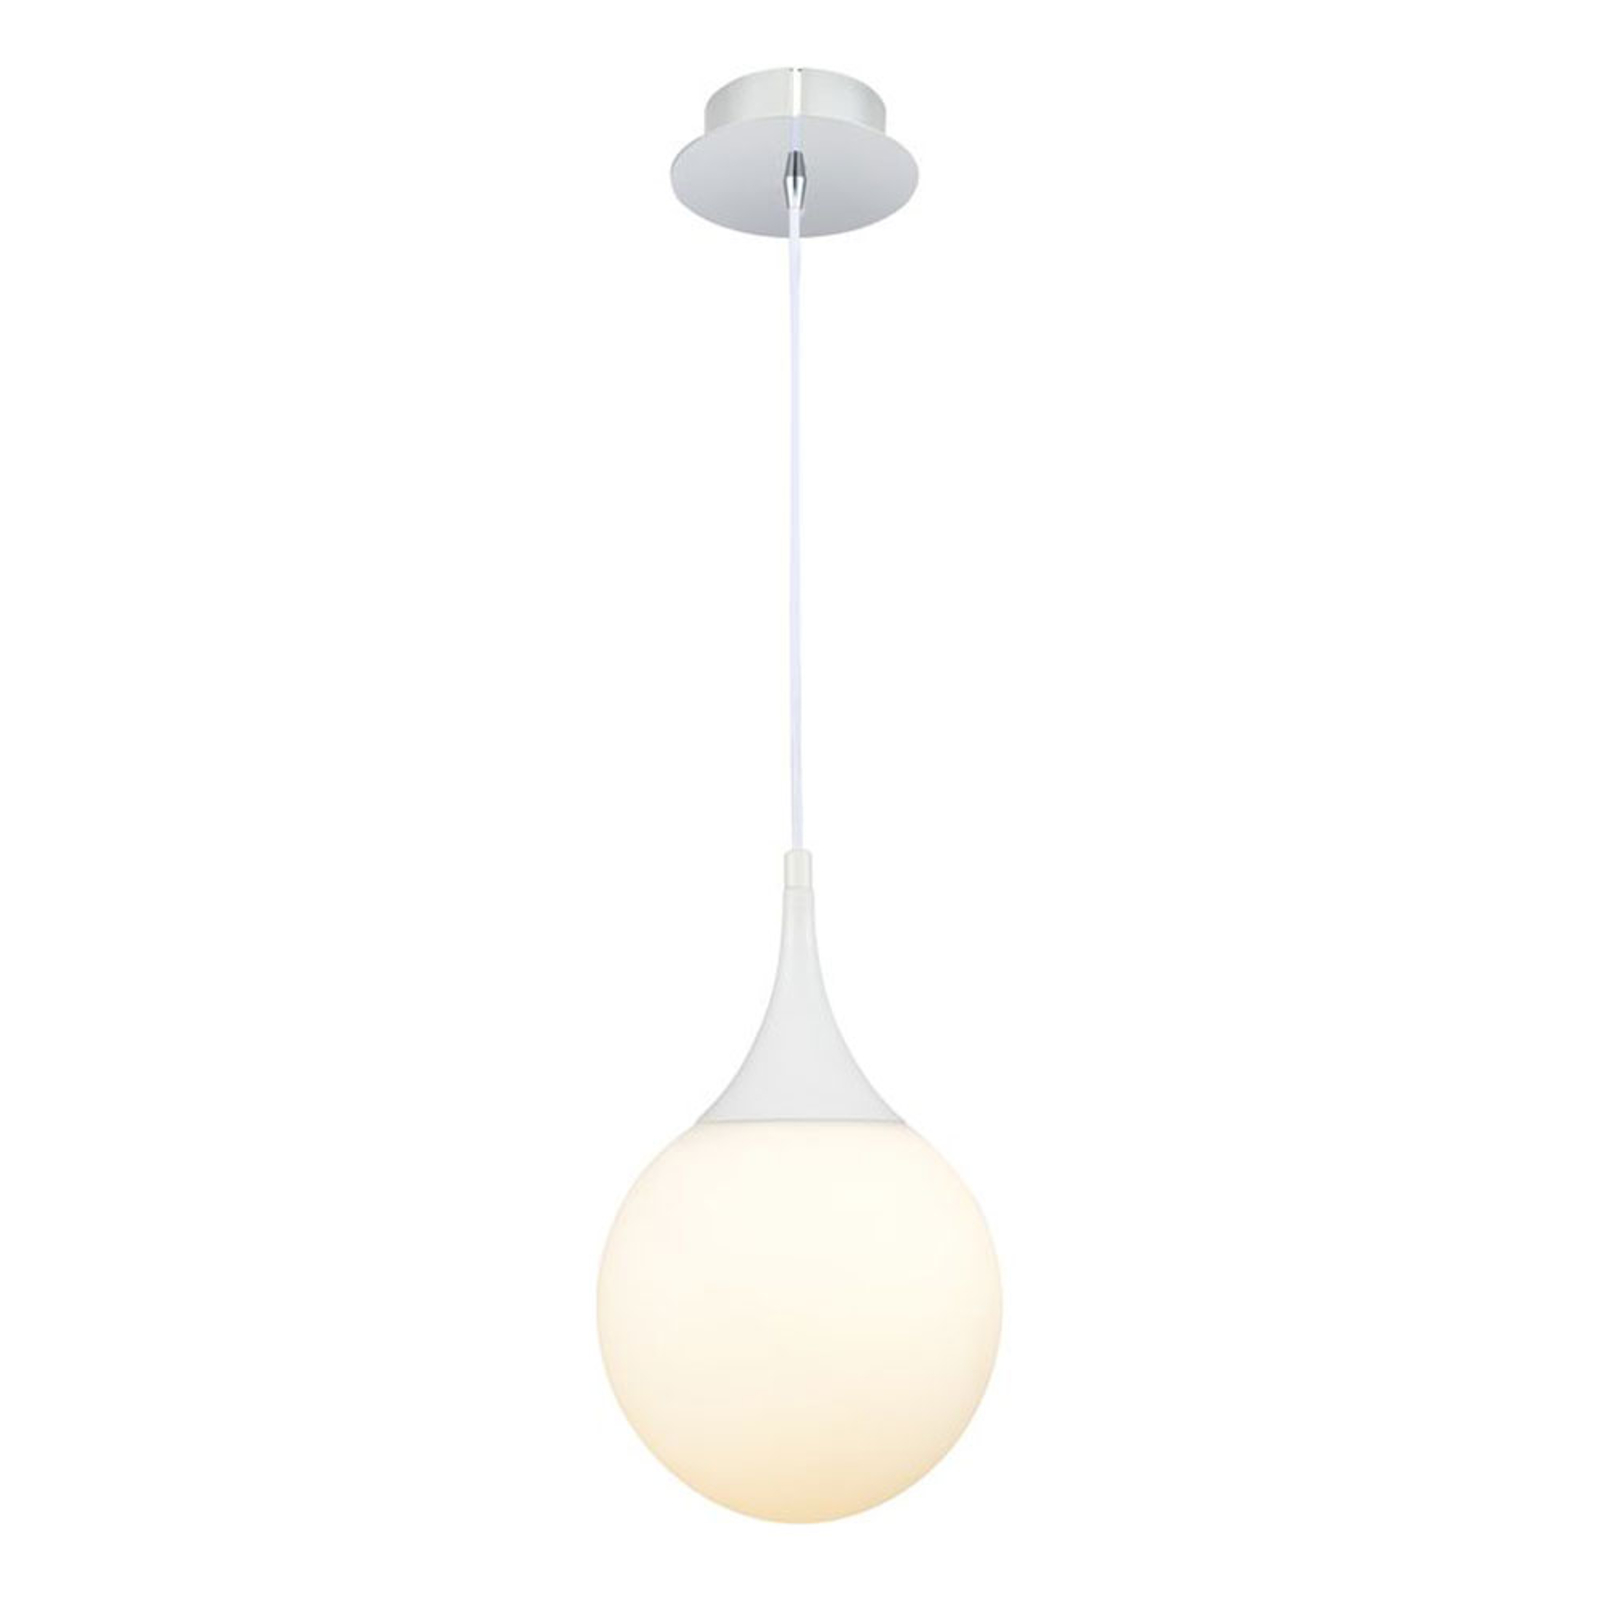 Lampada a sospensione Dewdrop bianca 20cm